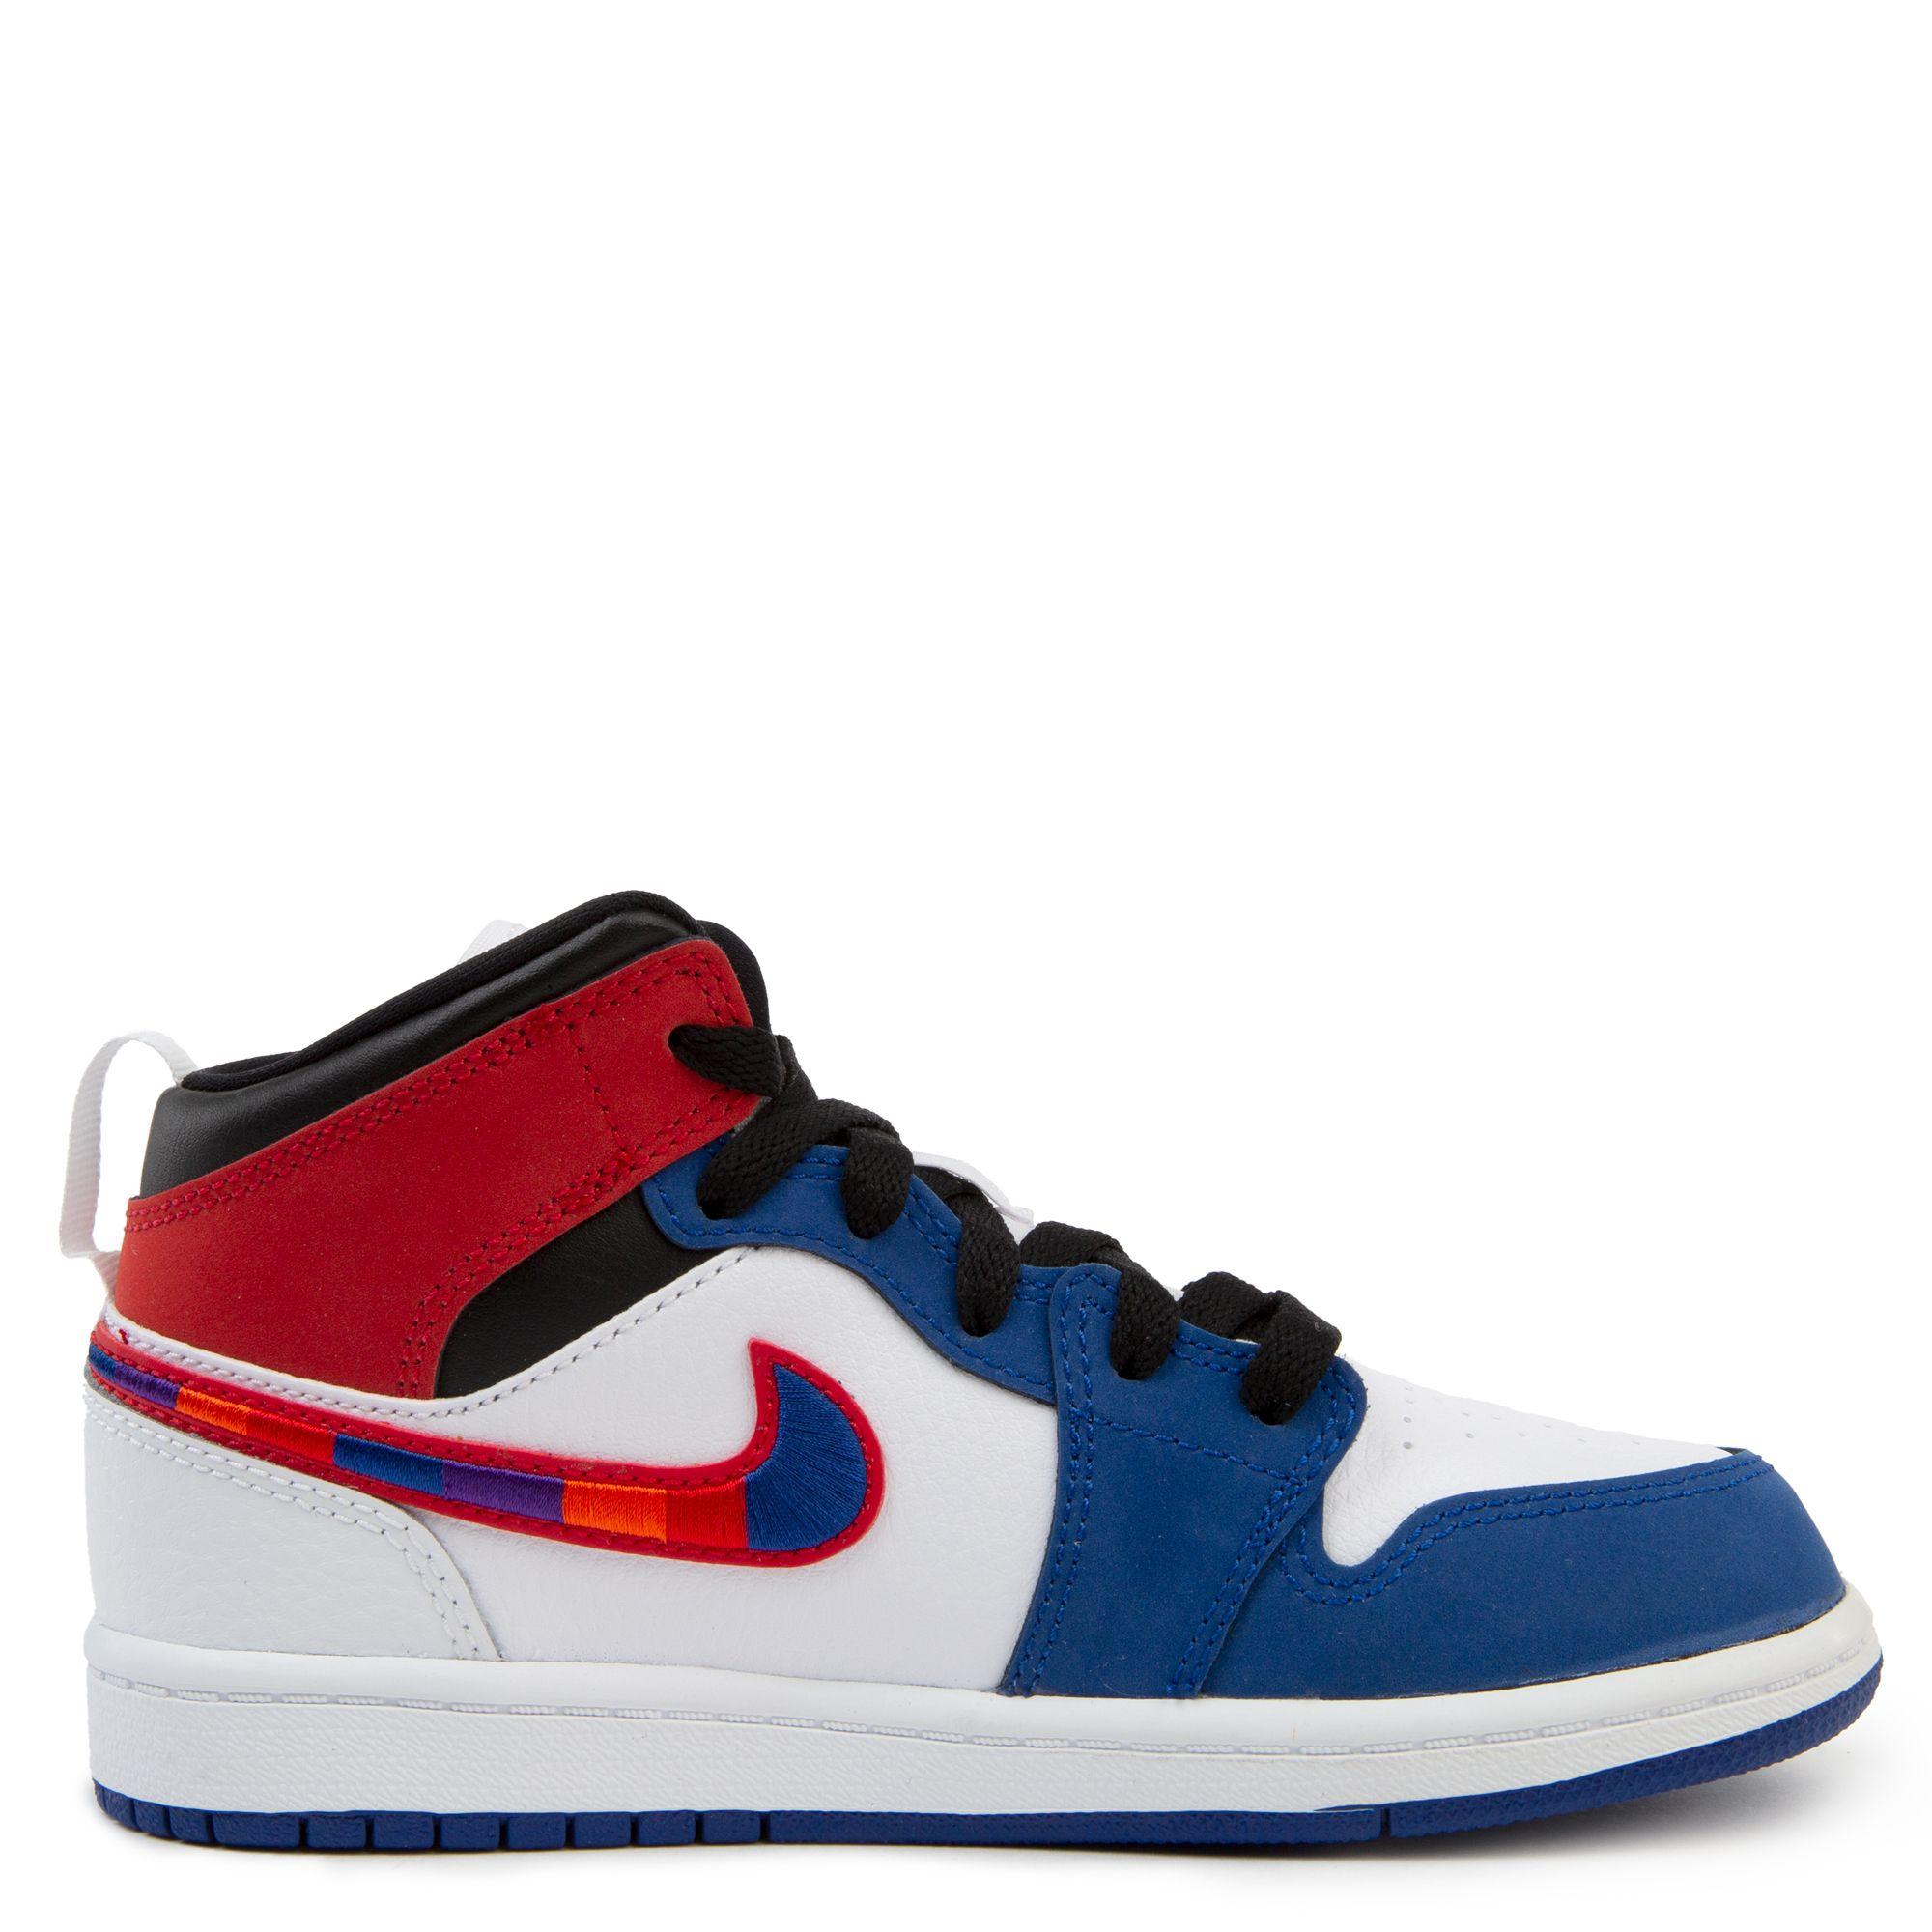 air jordan 1 red white blue